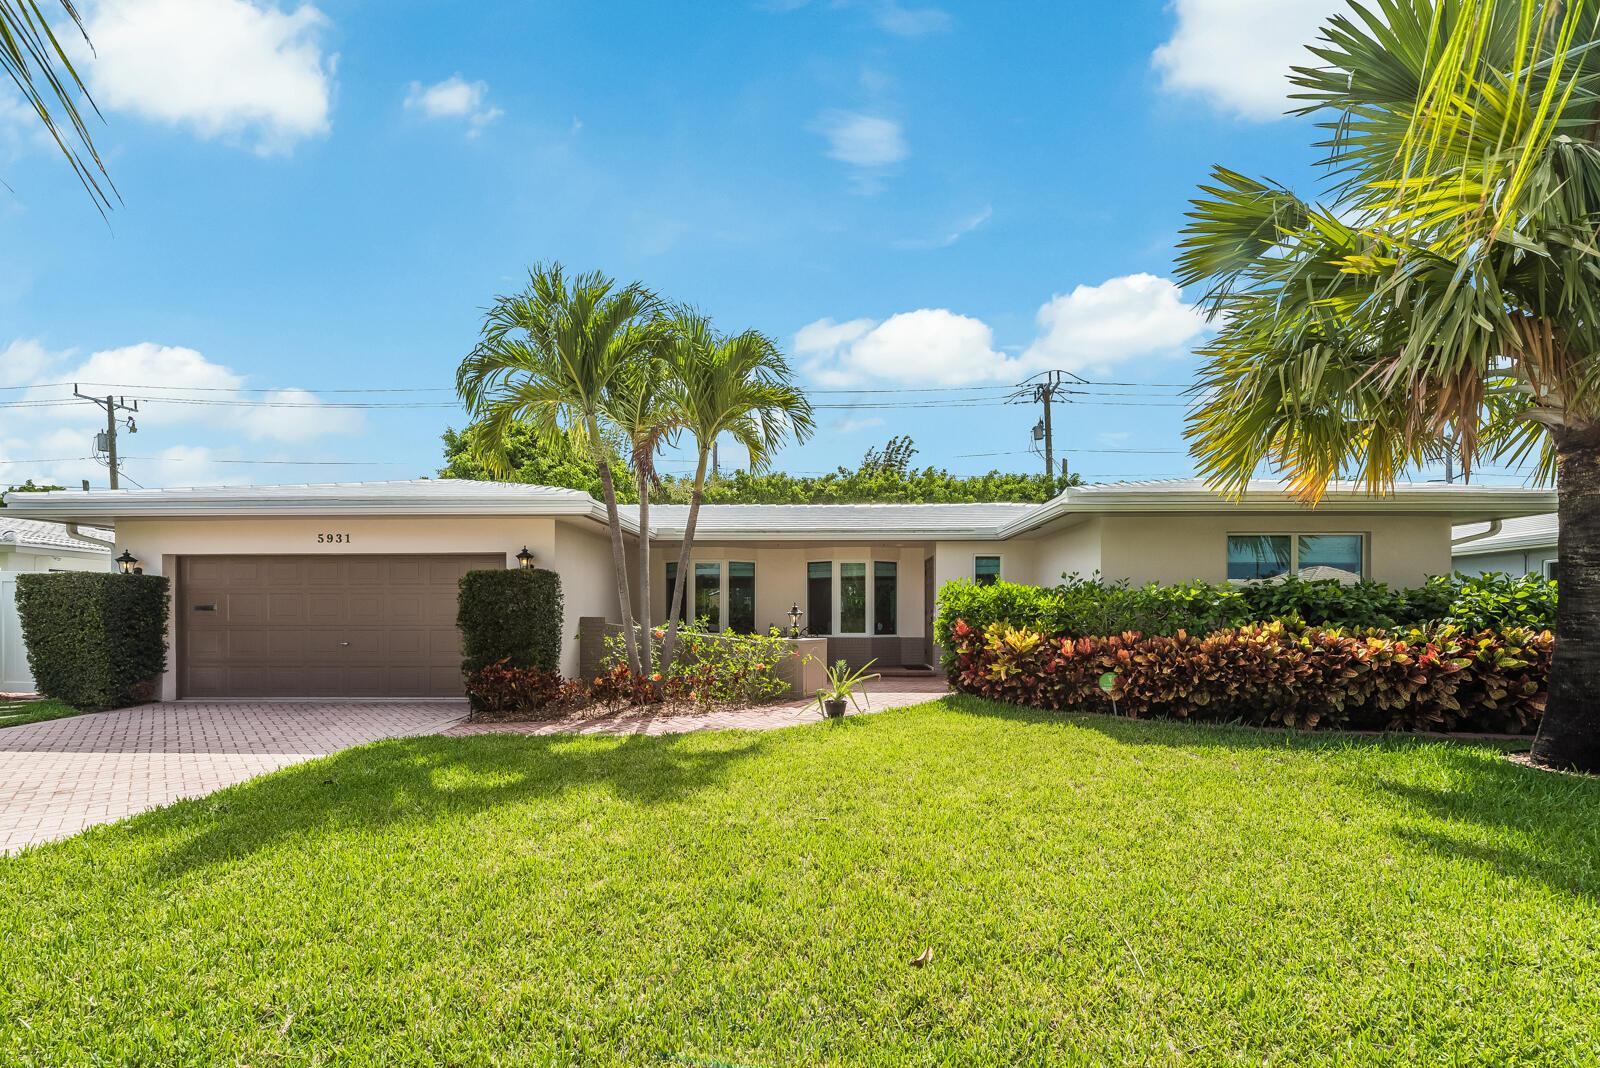 Details for 5931 18th Terrace Ne, Fort Lauderdale, FL 33308